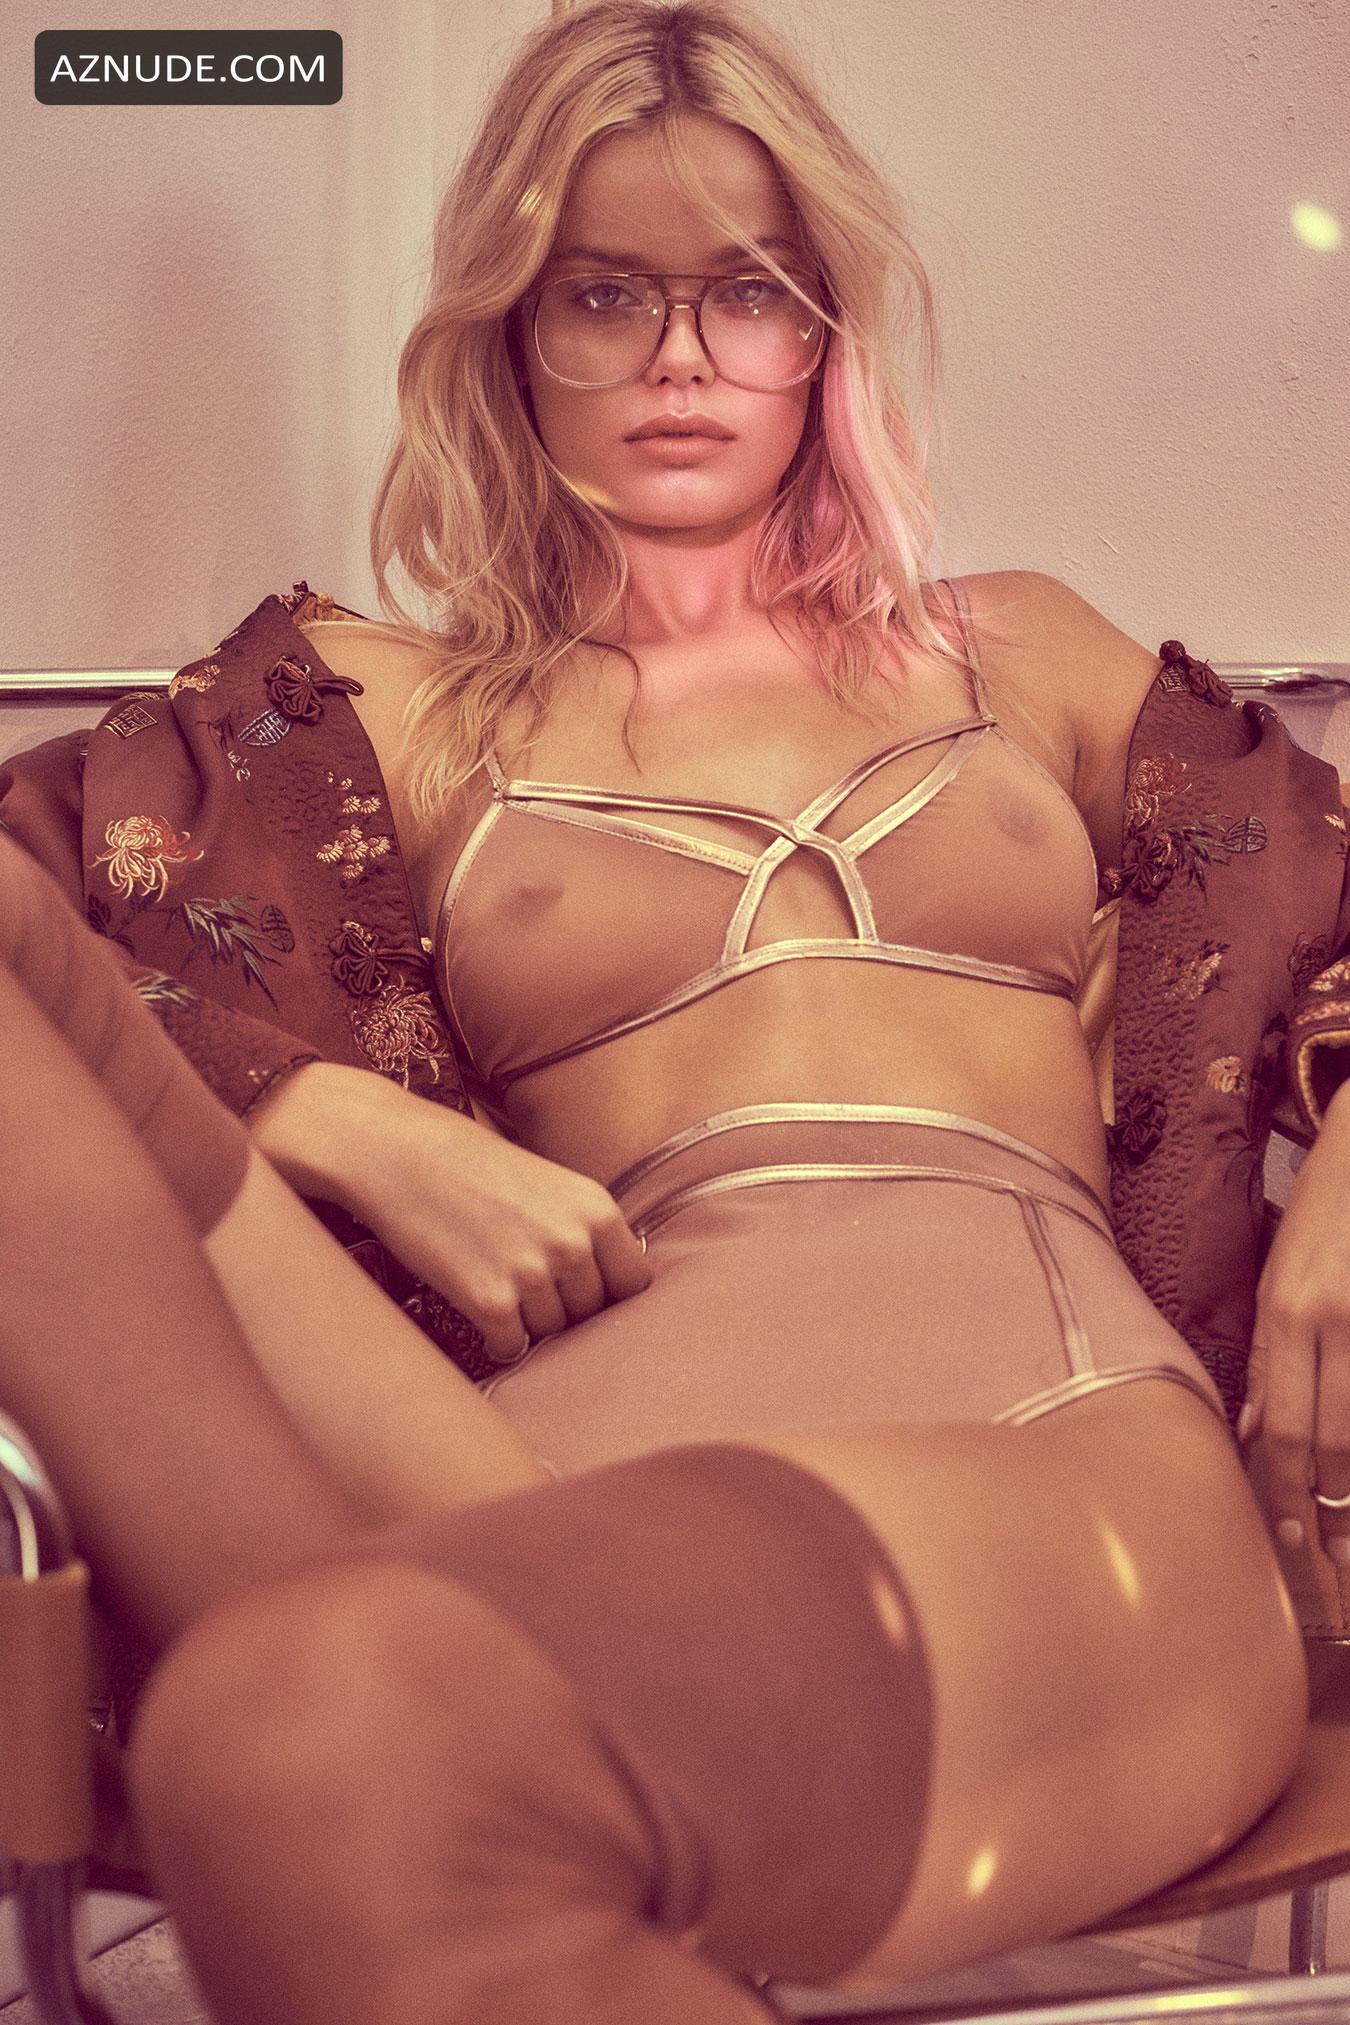 Frida Aasen Nude - Aznude-7914